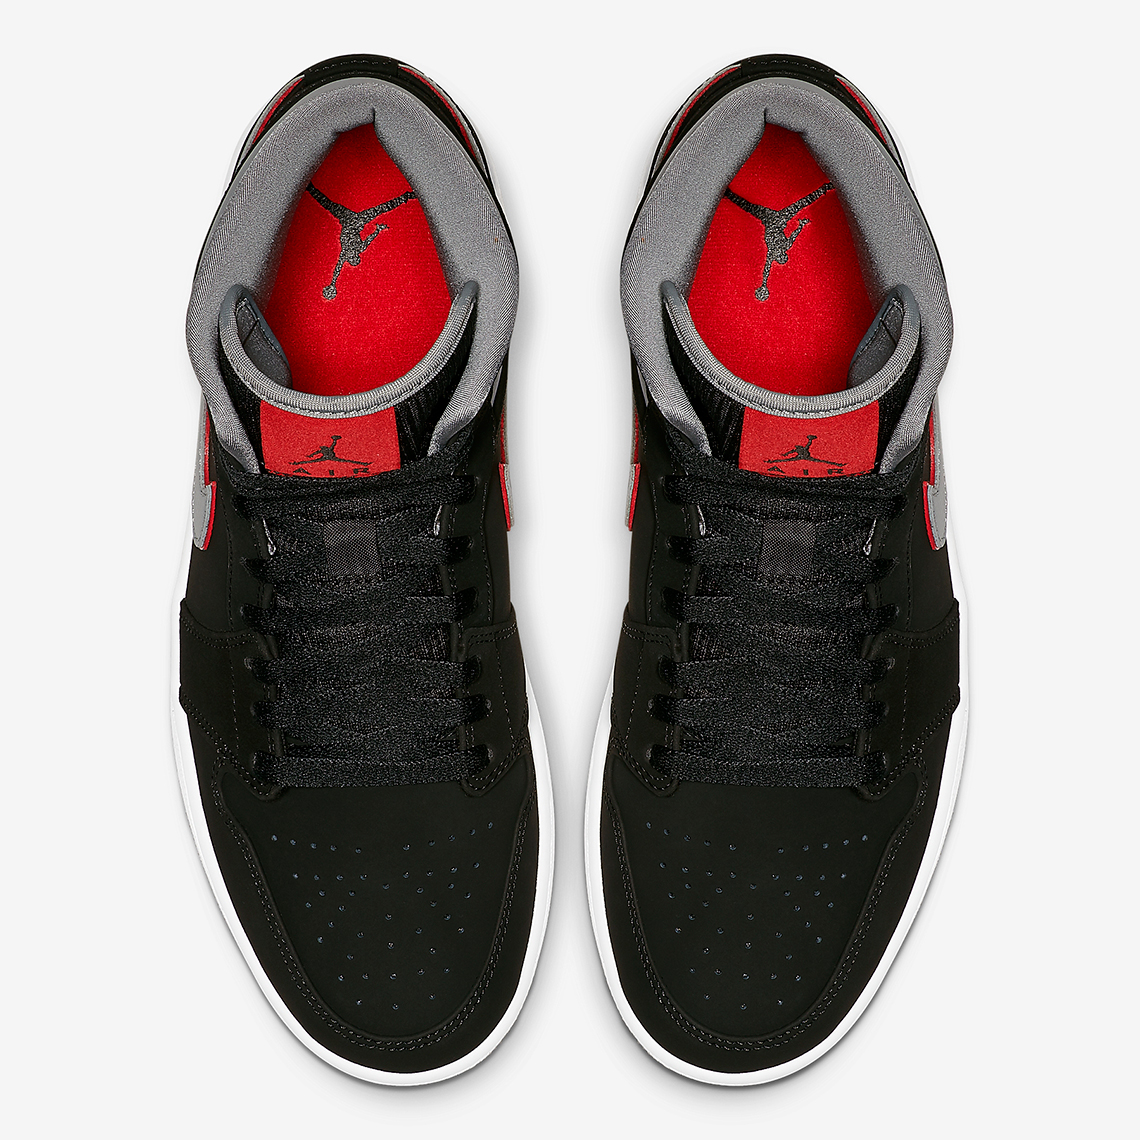 sports shoes a71f9 14d66 Jordan 1 Mid Black Grey Red 554724-060 Info | SneakerNews.com